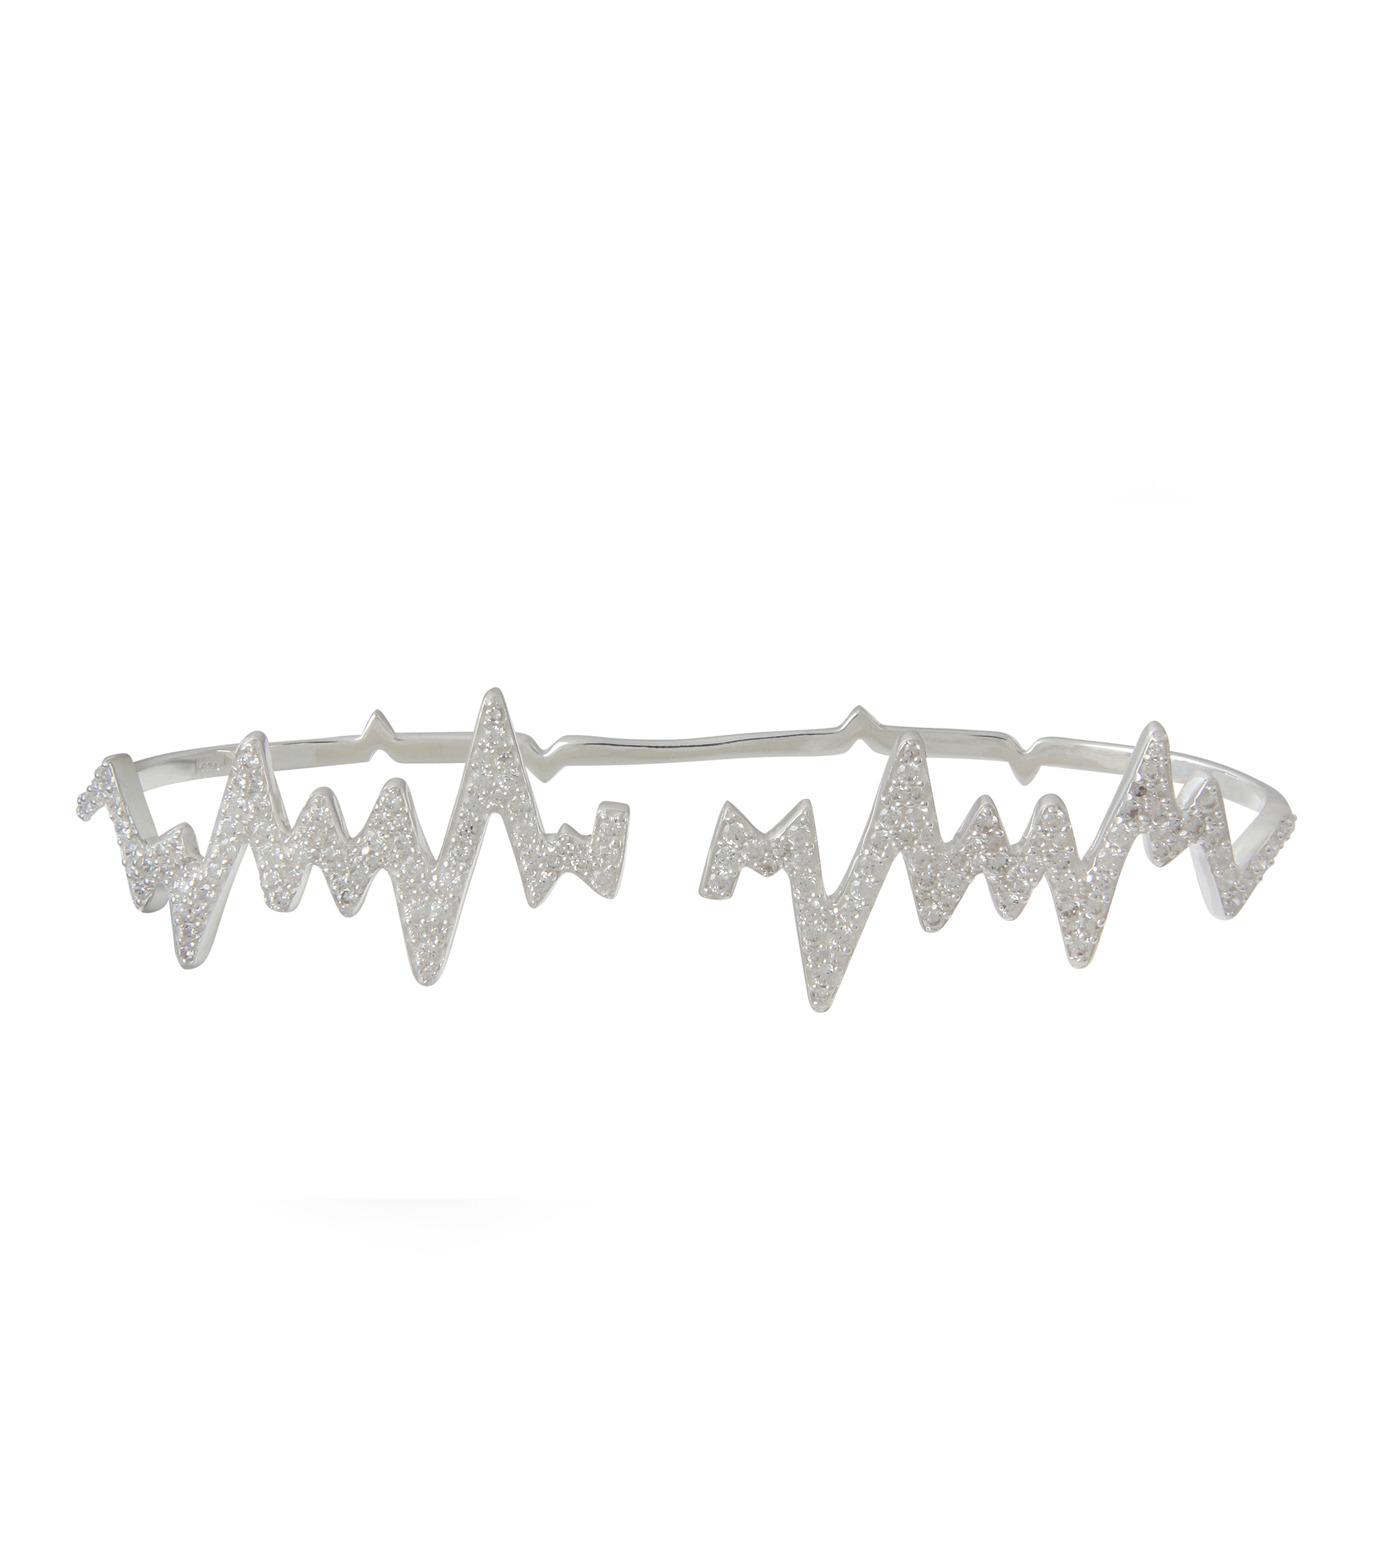 Priyanka(プリヤンカ)のLifeline Handcaff-SILVER(ブレスレット/bracelet)-LLA-01-1 拡大詳細画像1